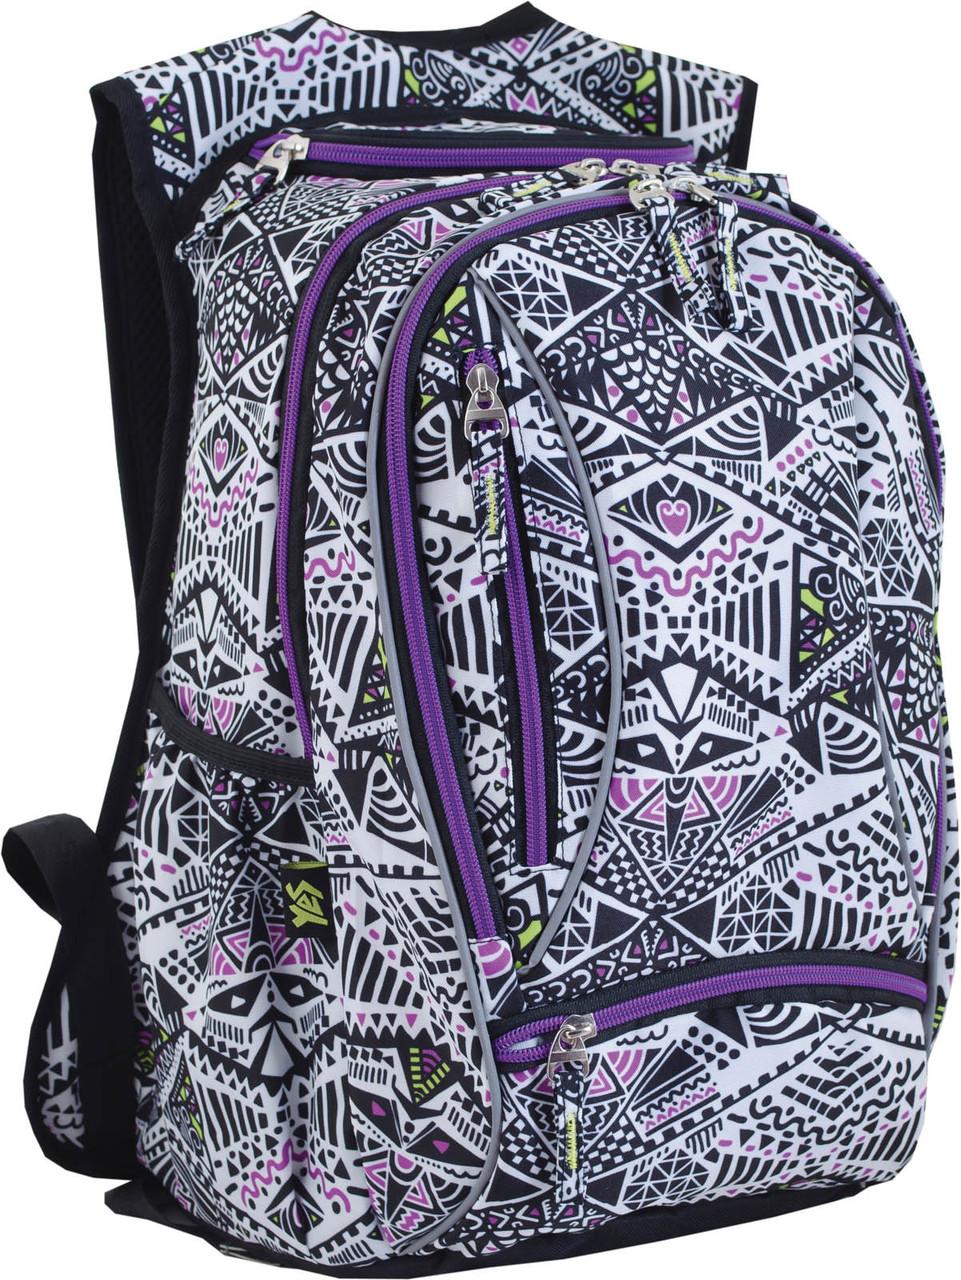 553160 Подростковый рюкзак YES T-28 Ice cream 40*25,5*20